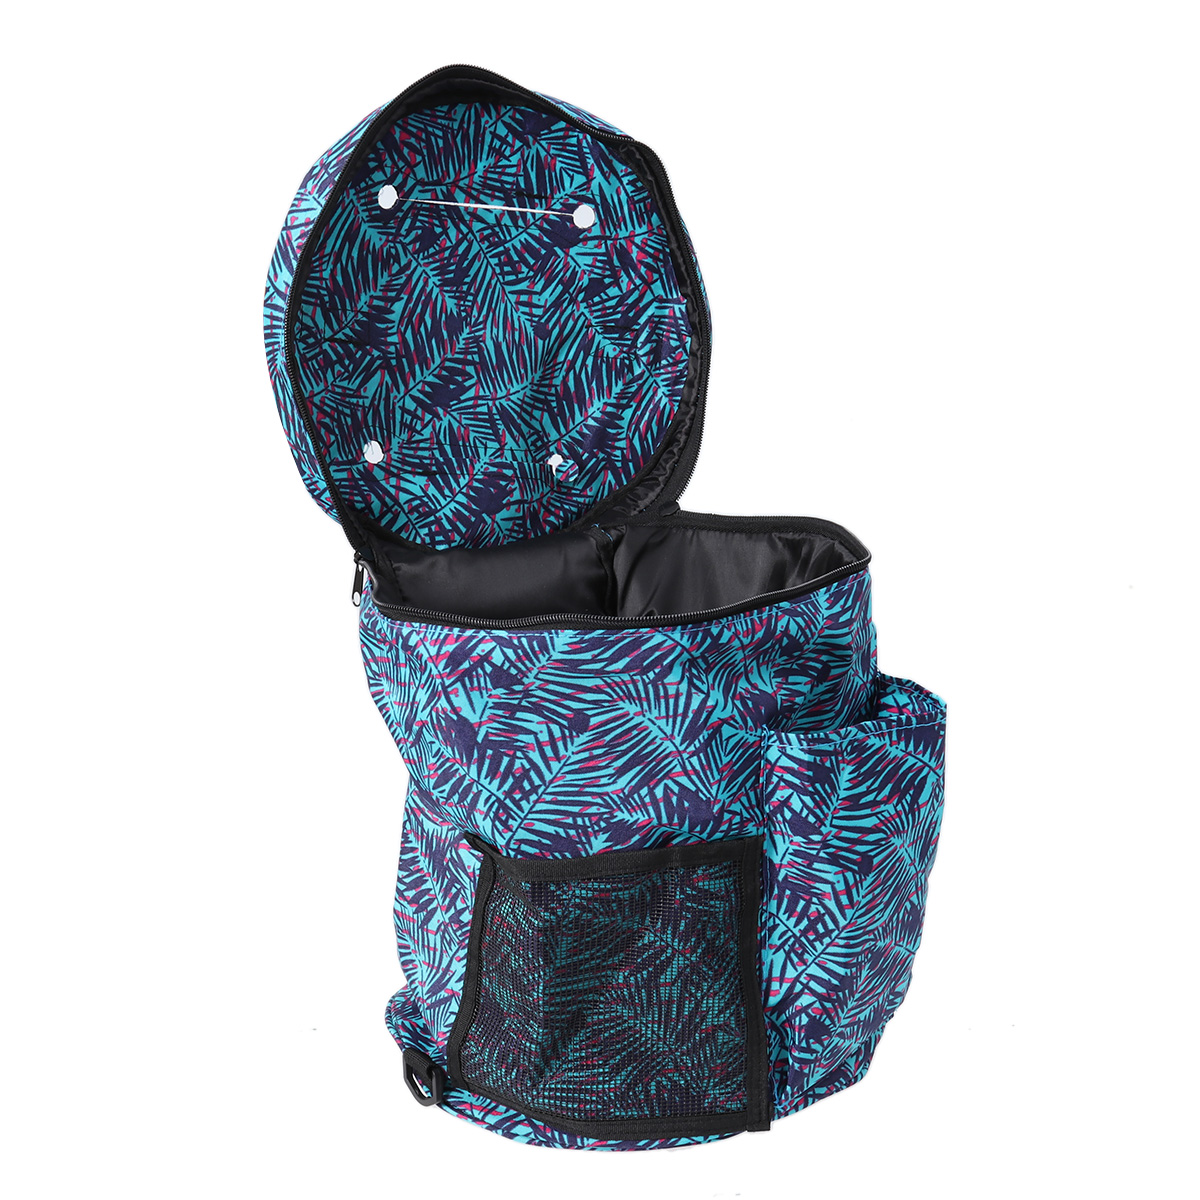 Convenient Durable Practical Crochet Storage Premium Durable Multifunction Knitting Bag Knitting Yarn Ball Holder Storage